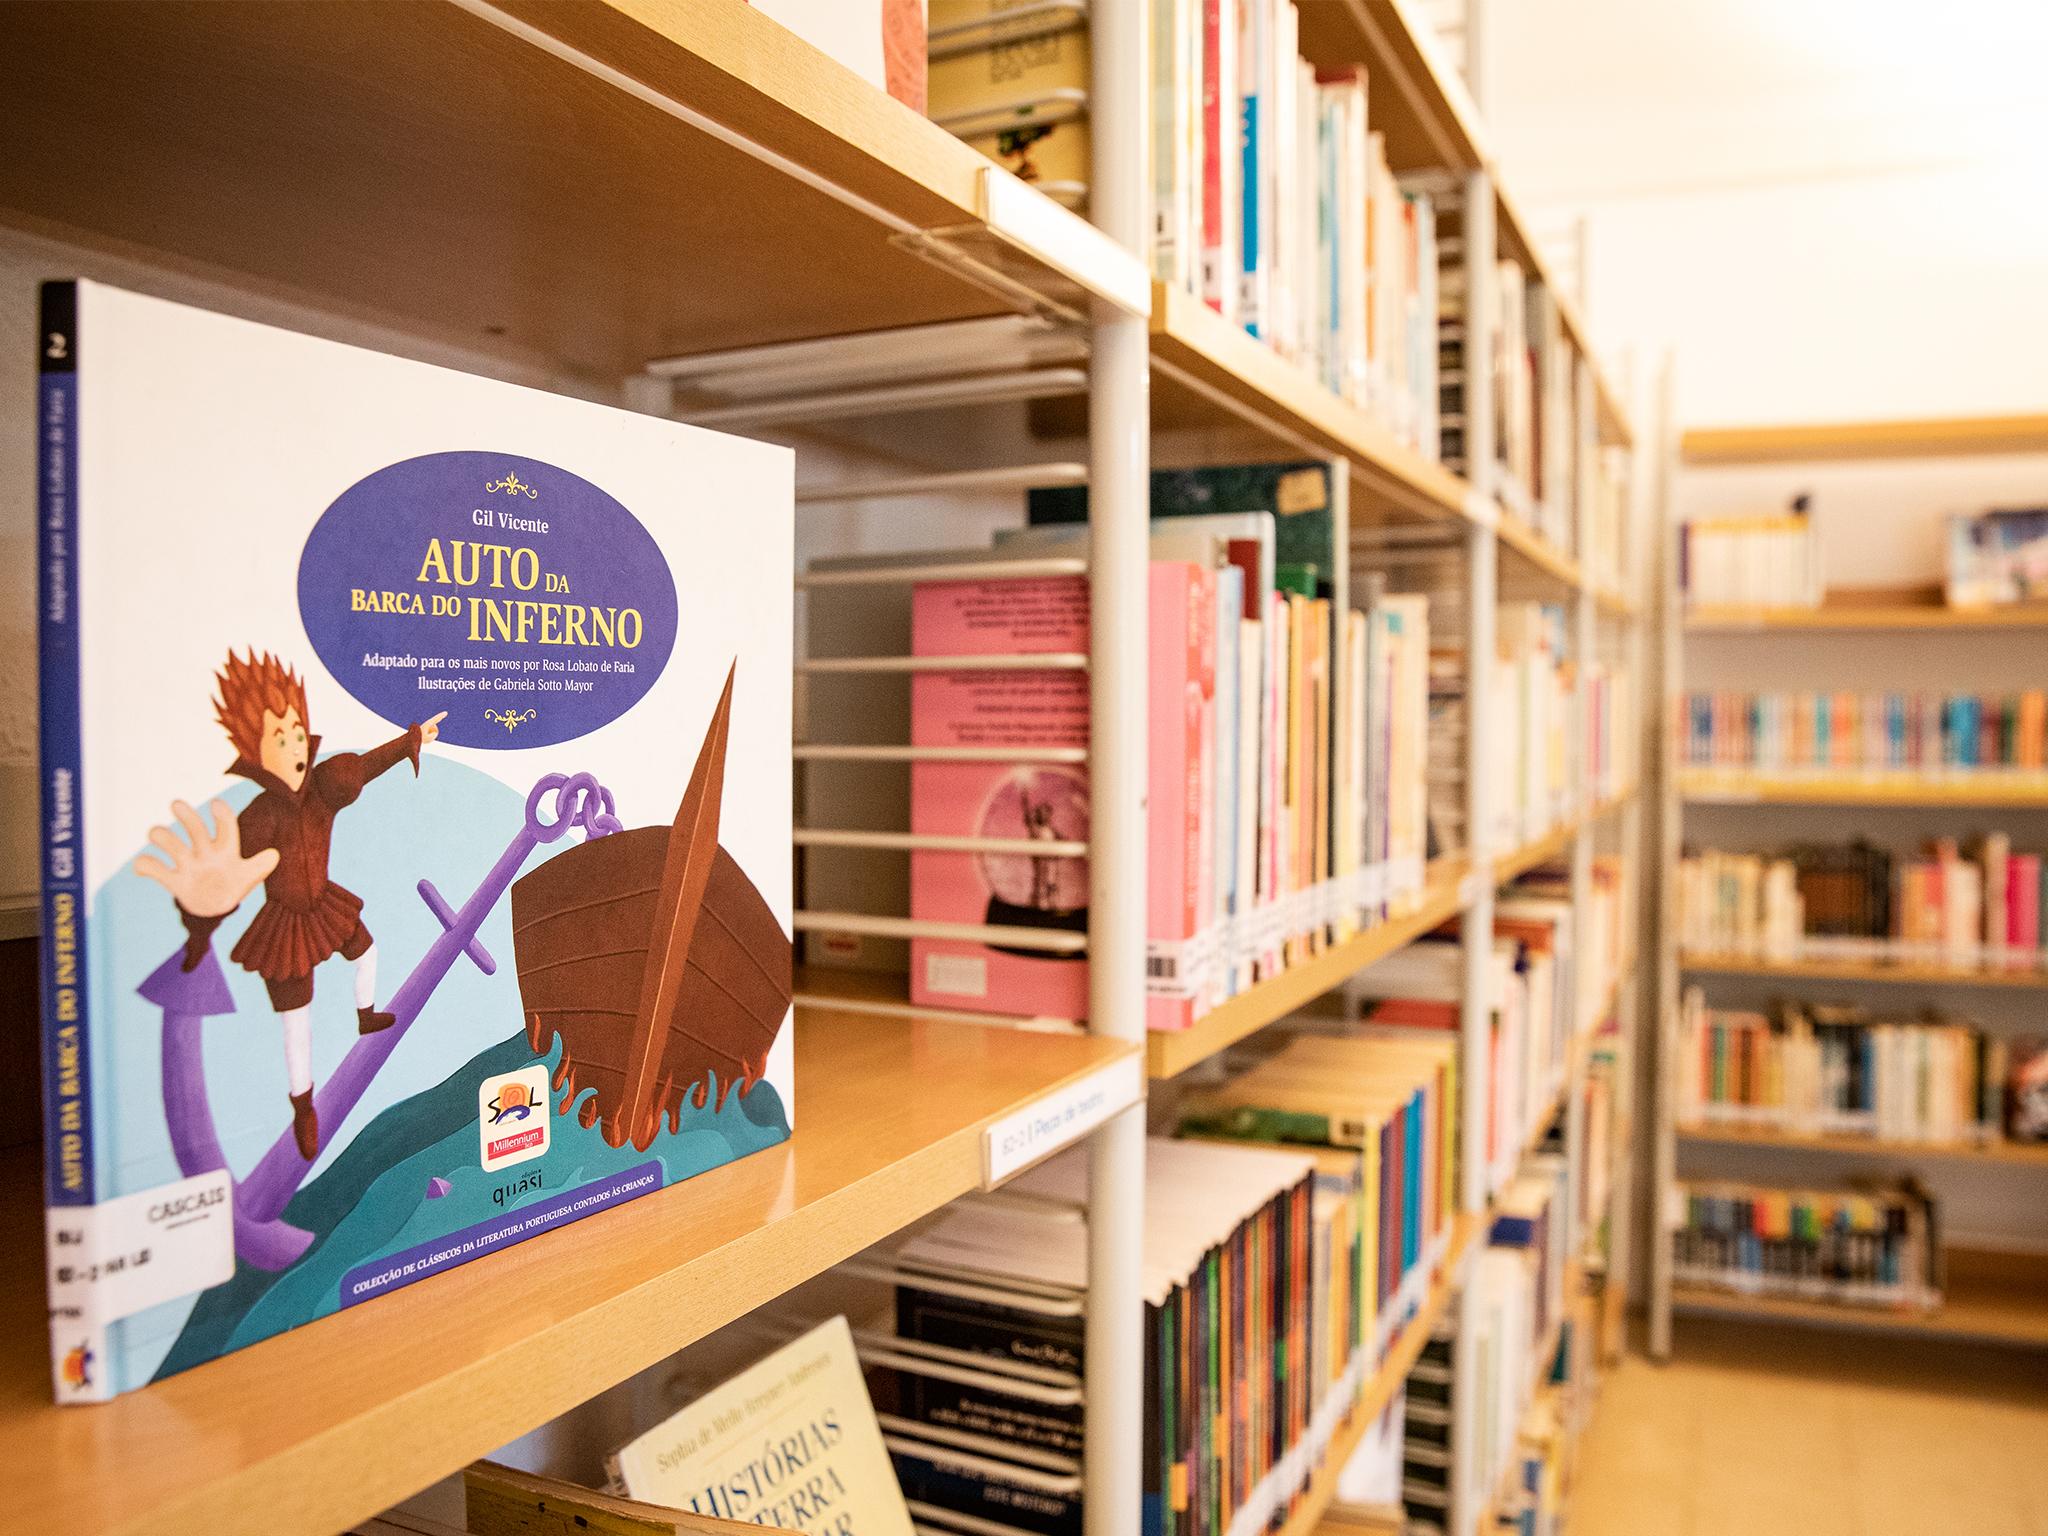 Biblioteca Infanto Juvenil, Parque Marechal Carmona, Cascais